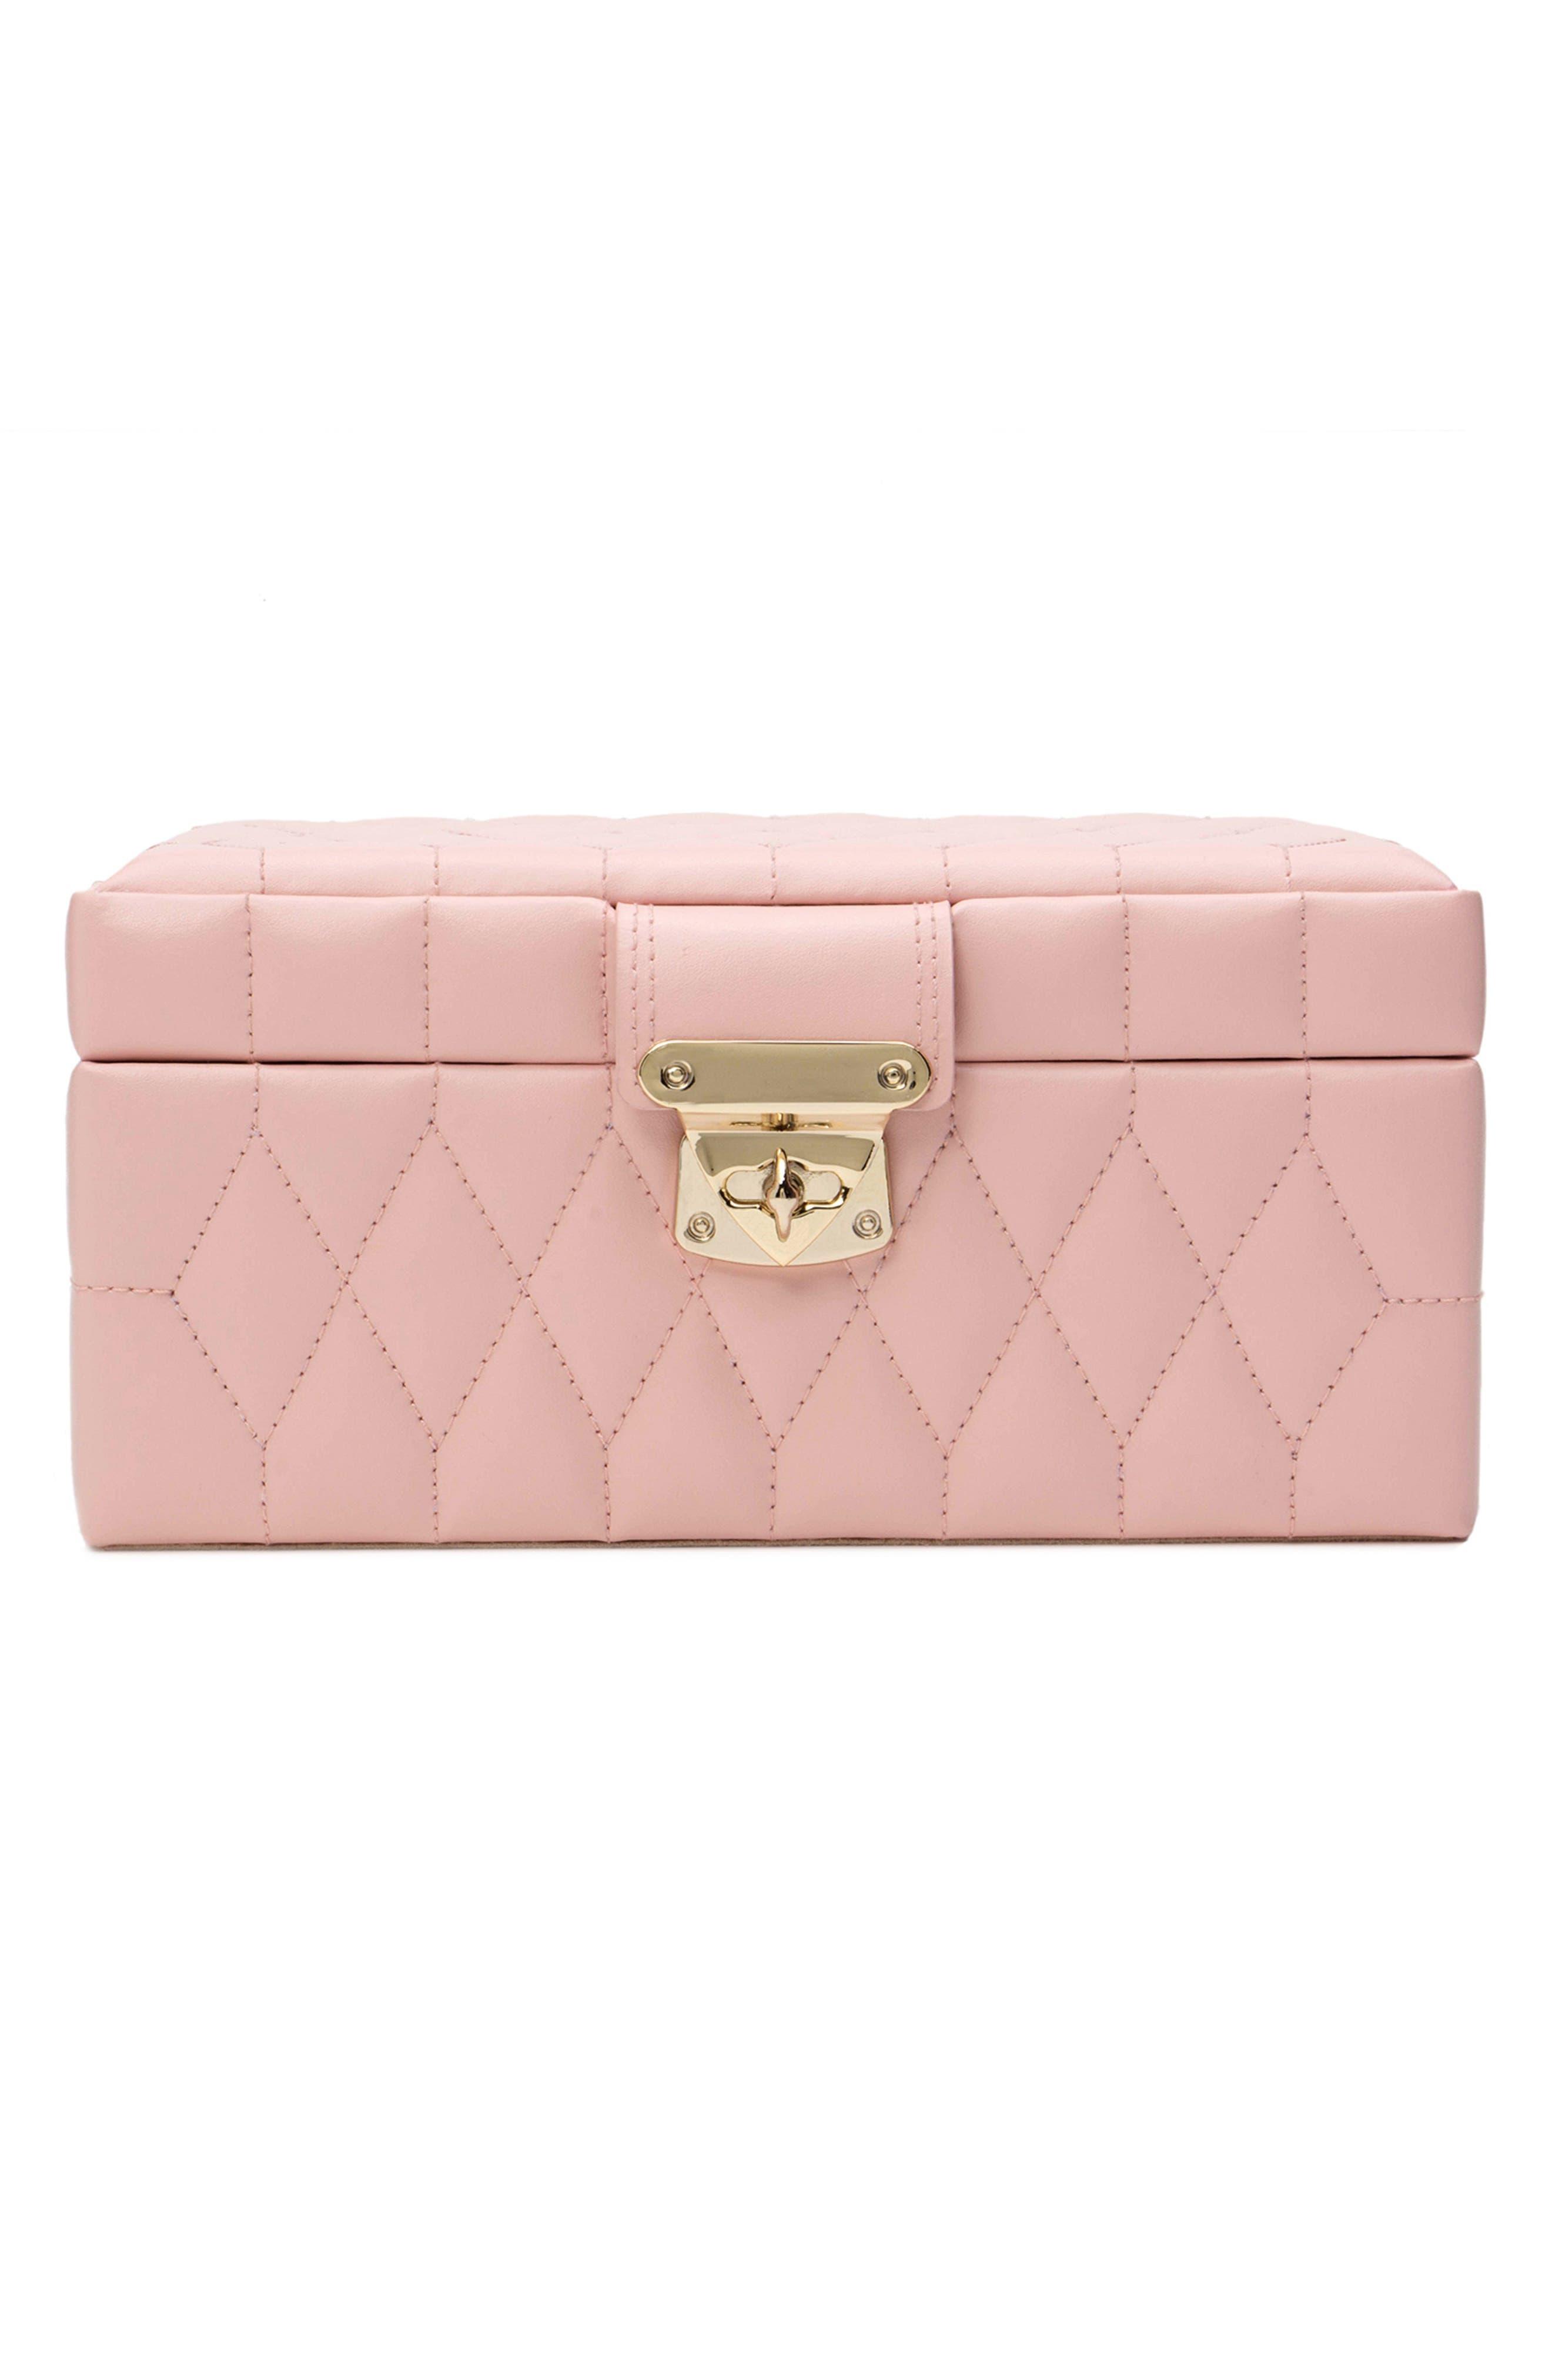 WOLF Caroline Small Travel Jewelry Case - Pink in Rose Quartz